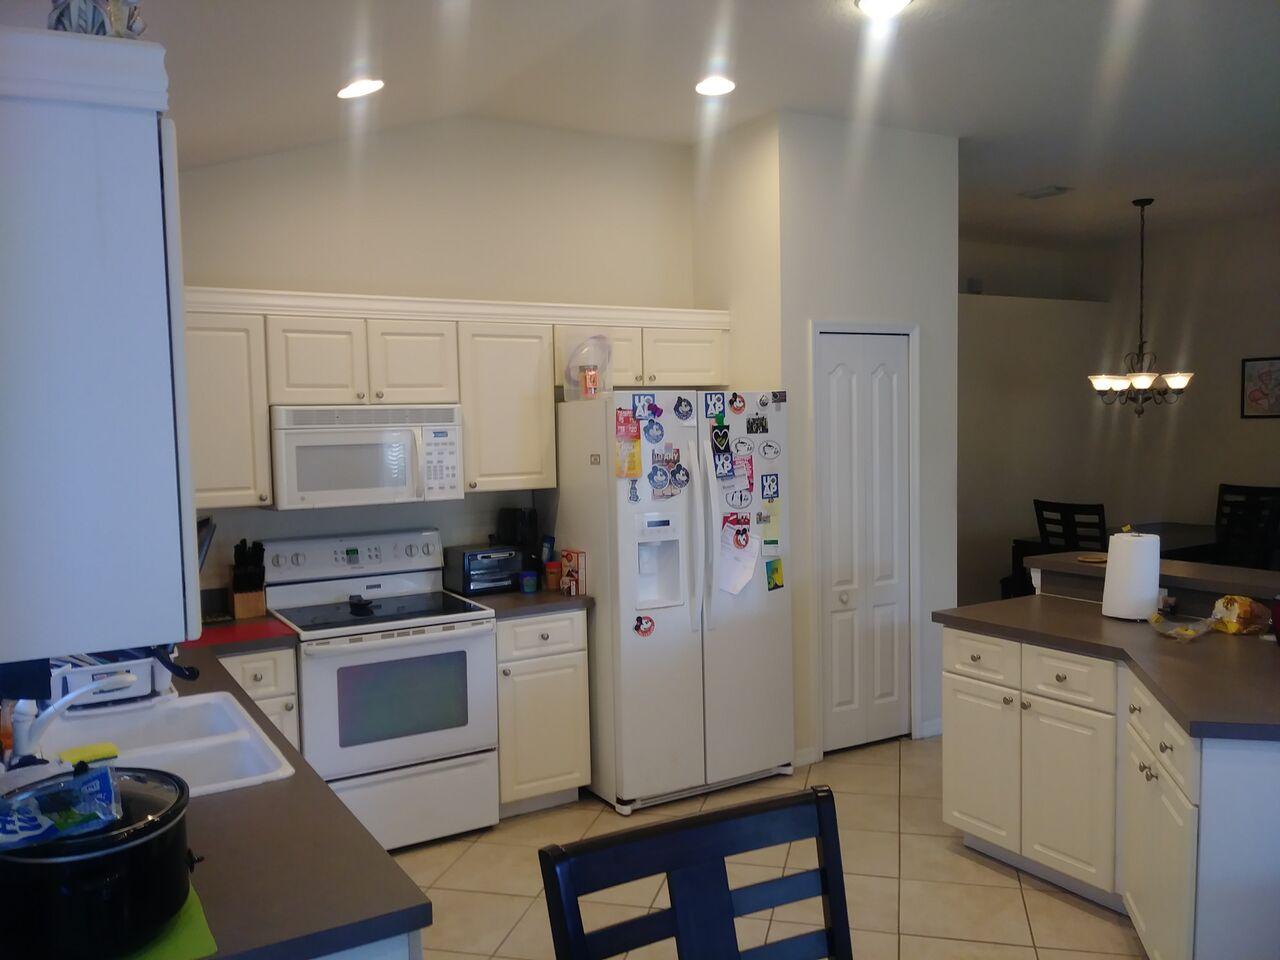 Photo of 9828 White Barn Way, Riverview, FL, 33569